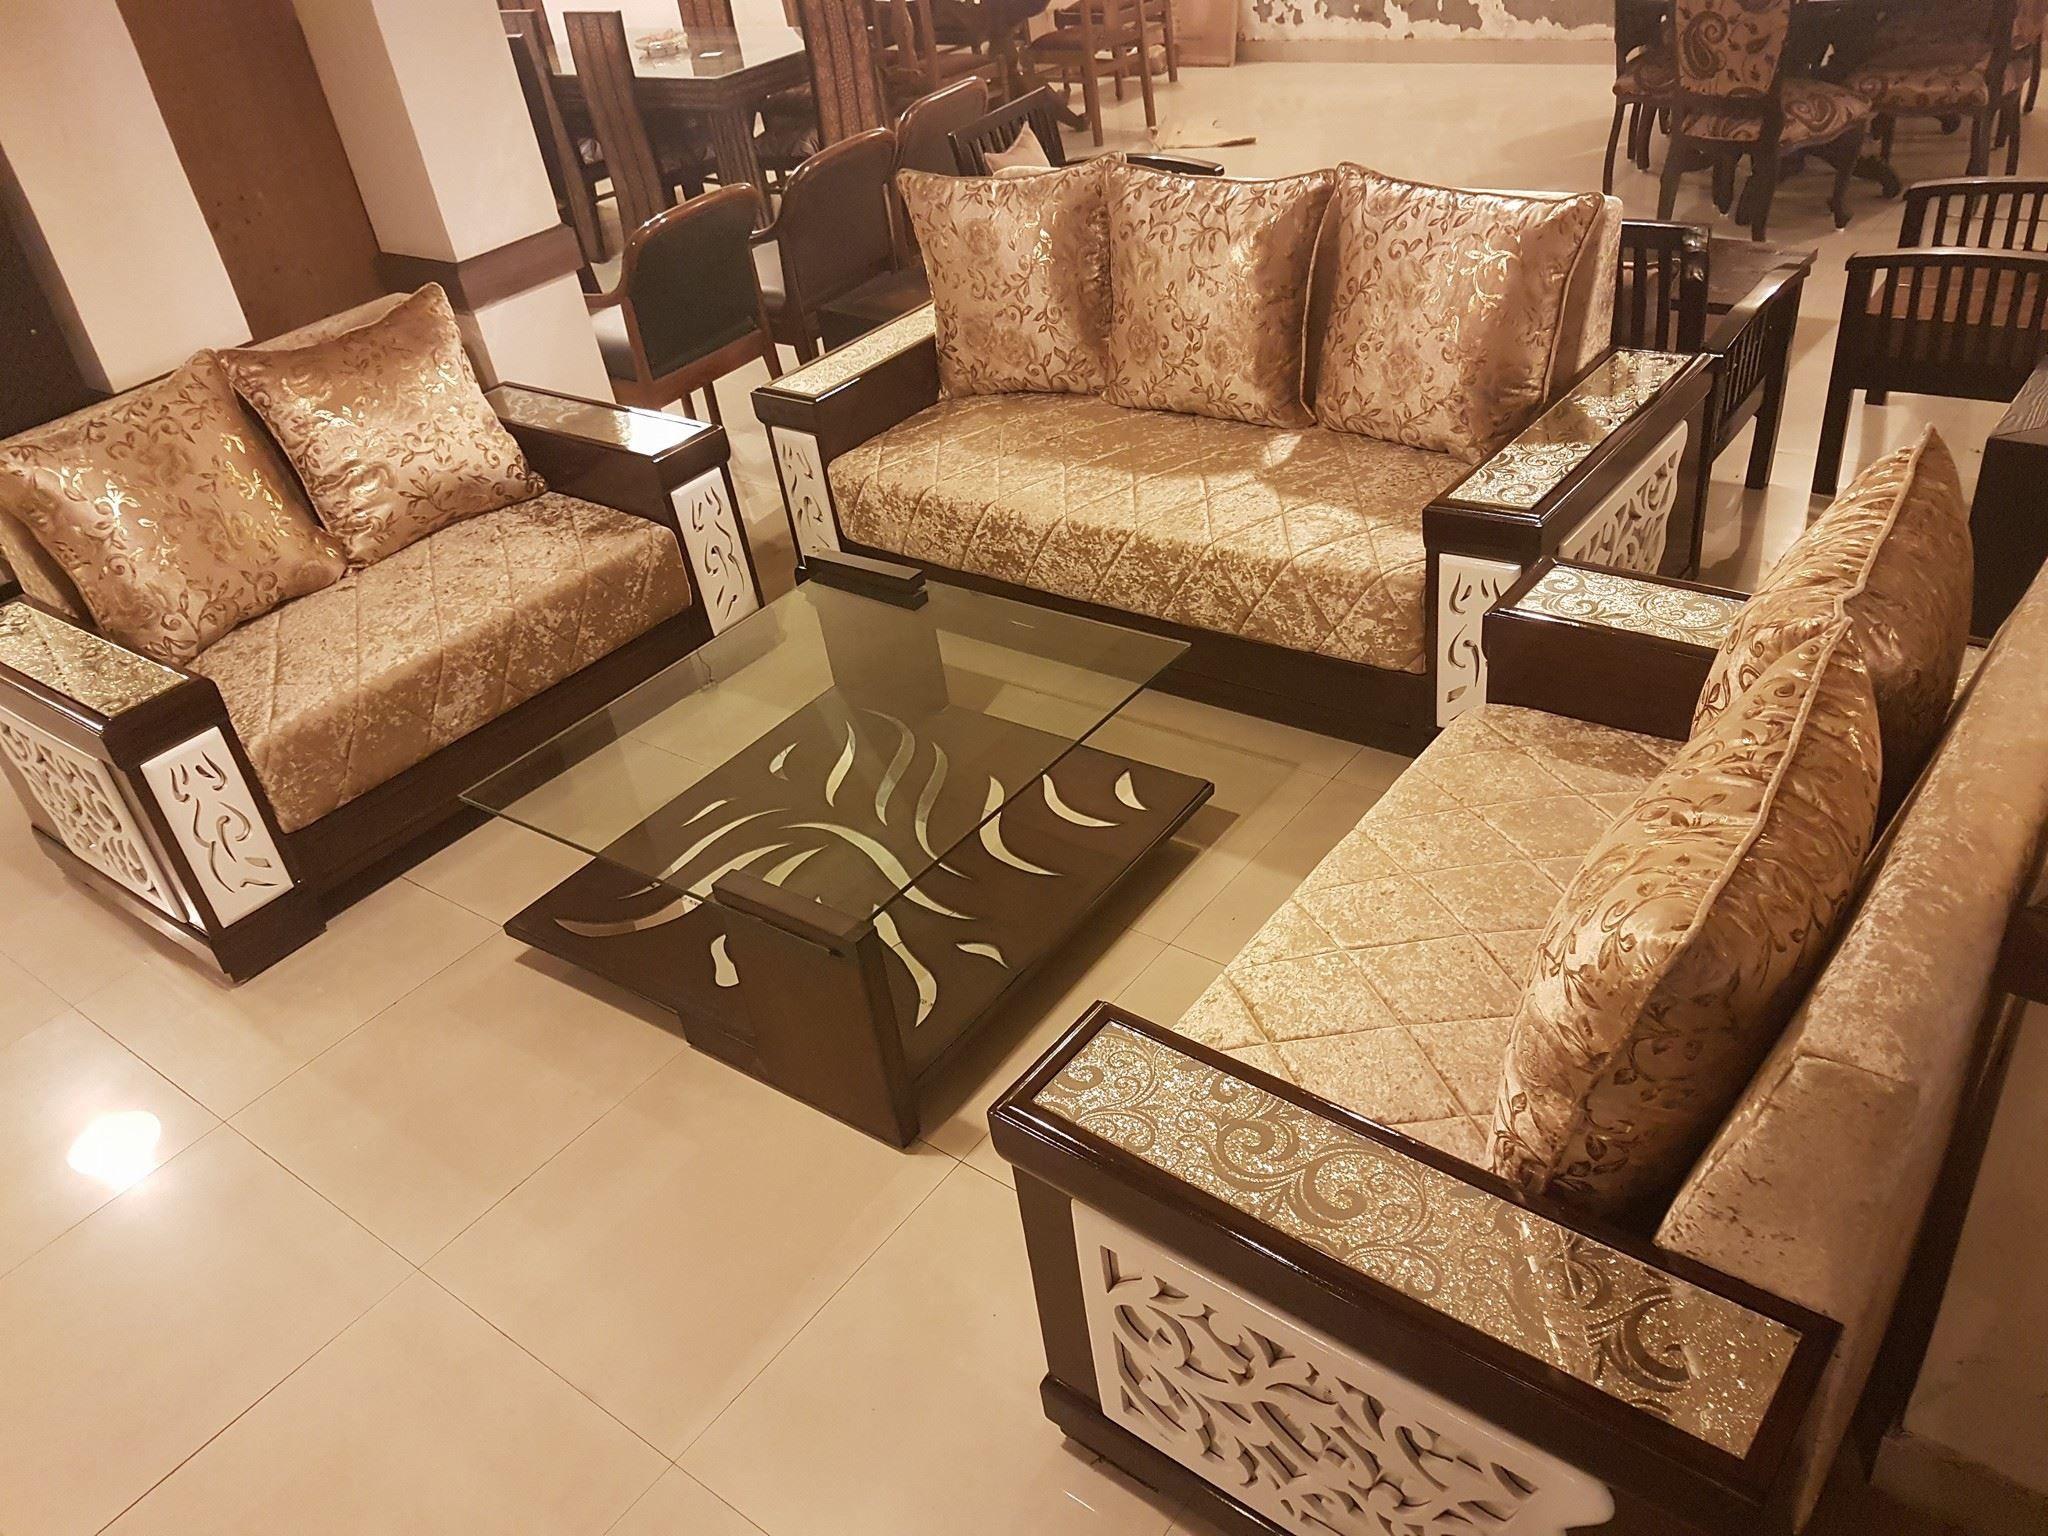 Pin by Er ਮੰਨੂ on Sofas design Sofa design, Home decor